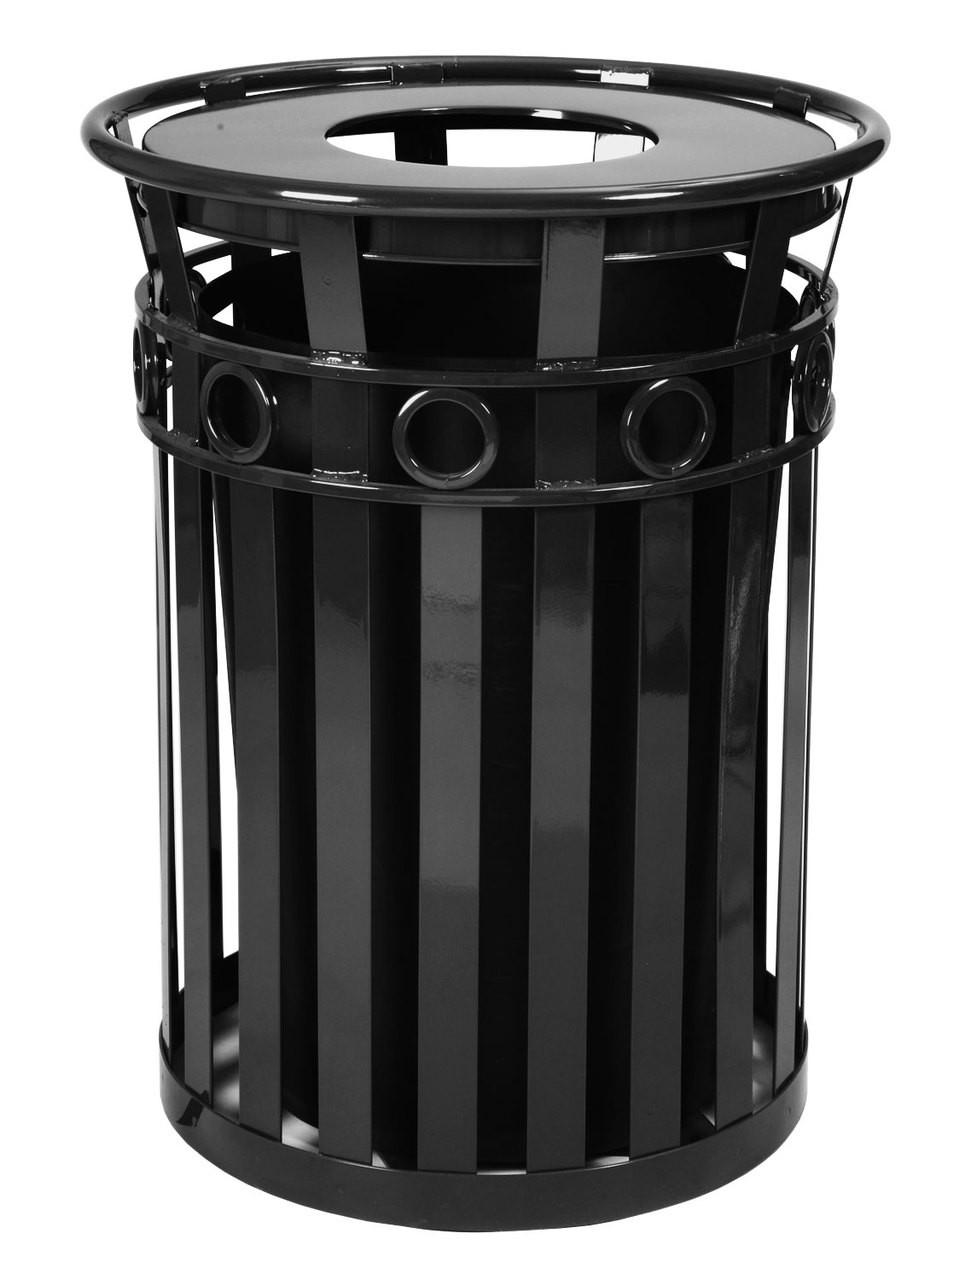 40 Gallon Oakley M3600-R-FT-BK Outdoor Waste Receptacle Black